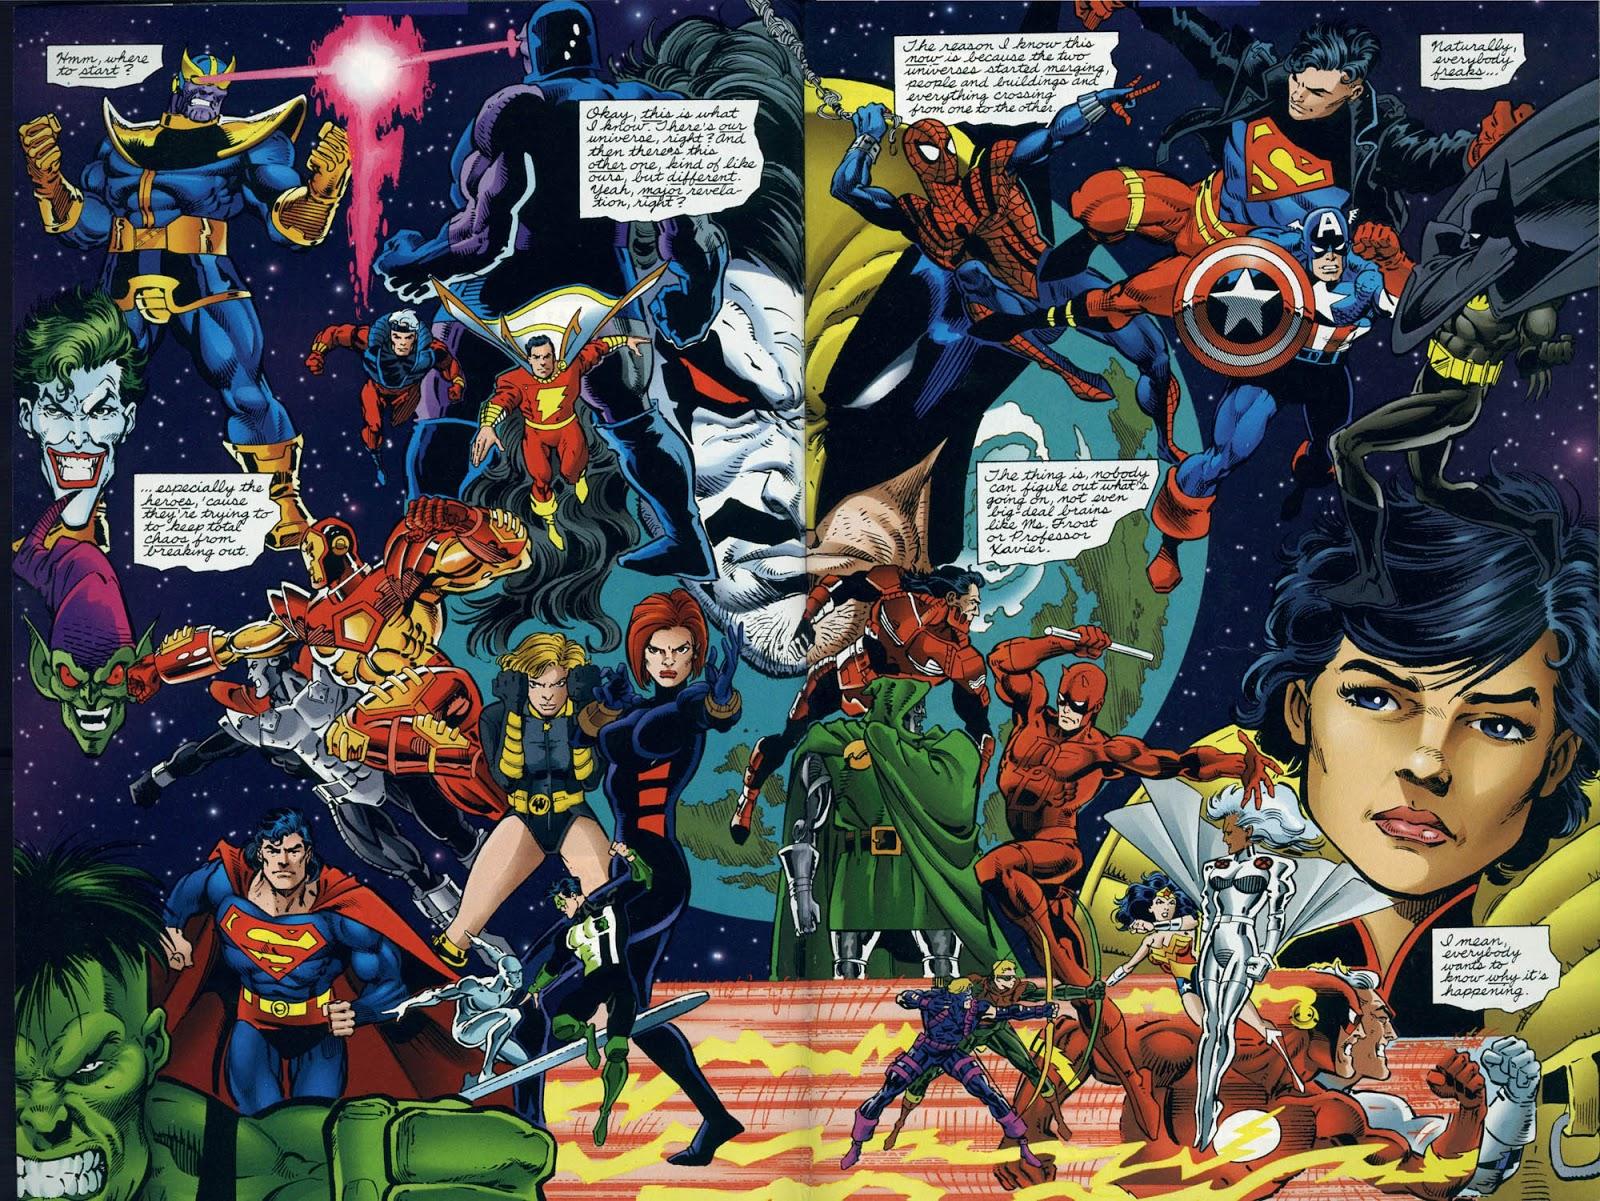 DC Versus Marvel review